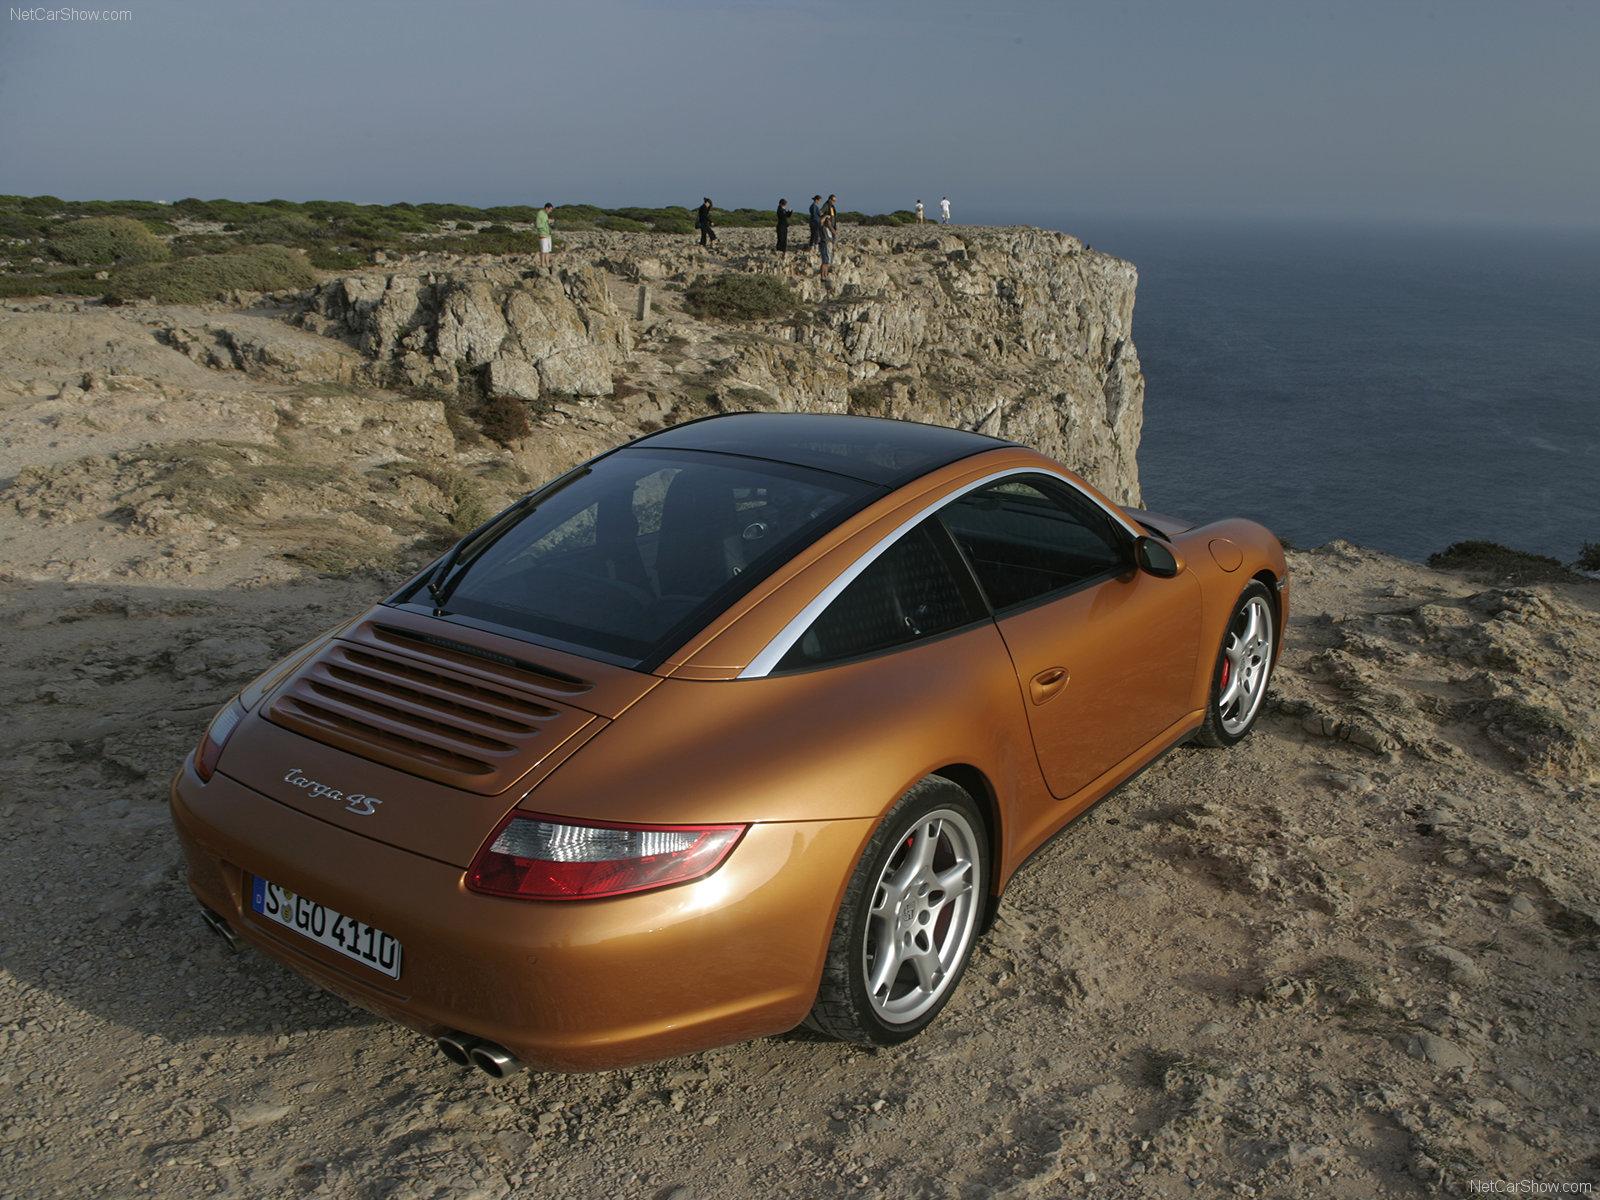 2007 Gold Porsche 911 Targa 4s Wallpapers